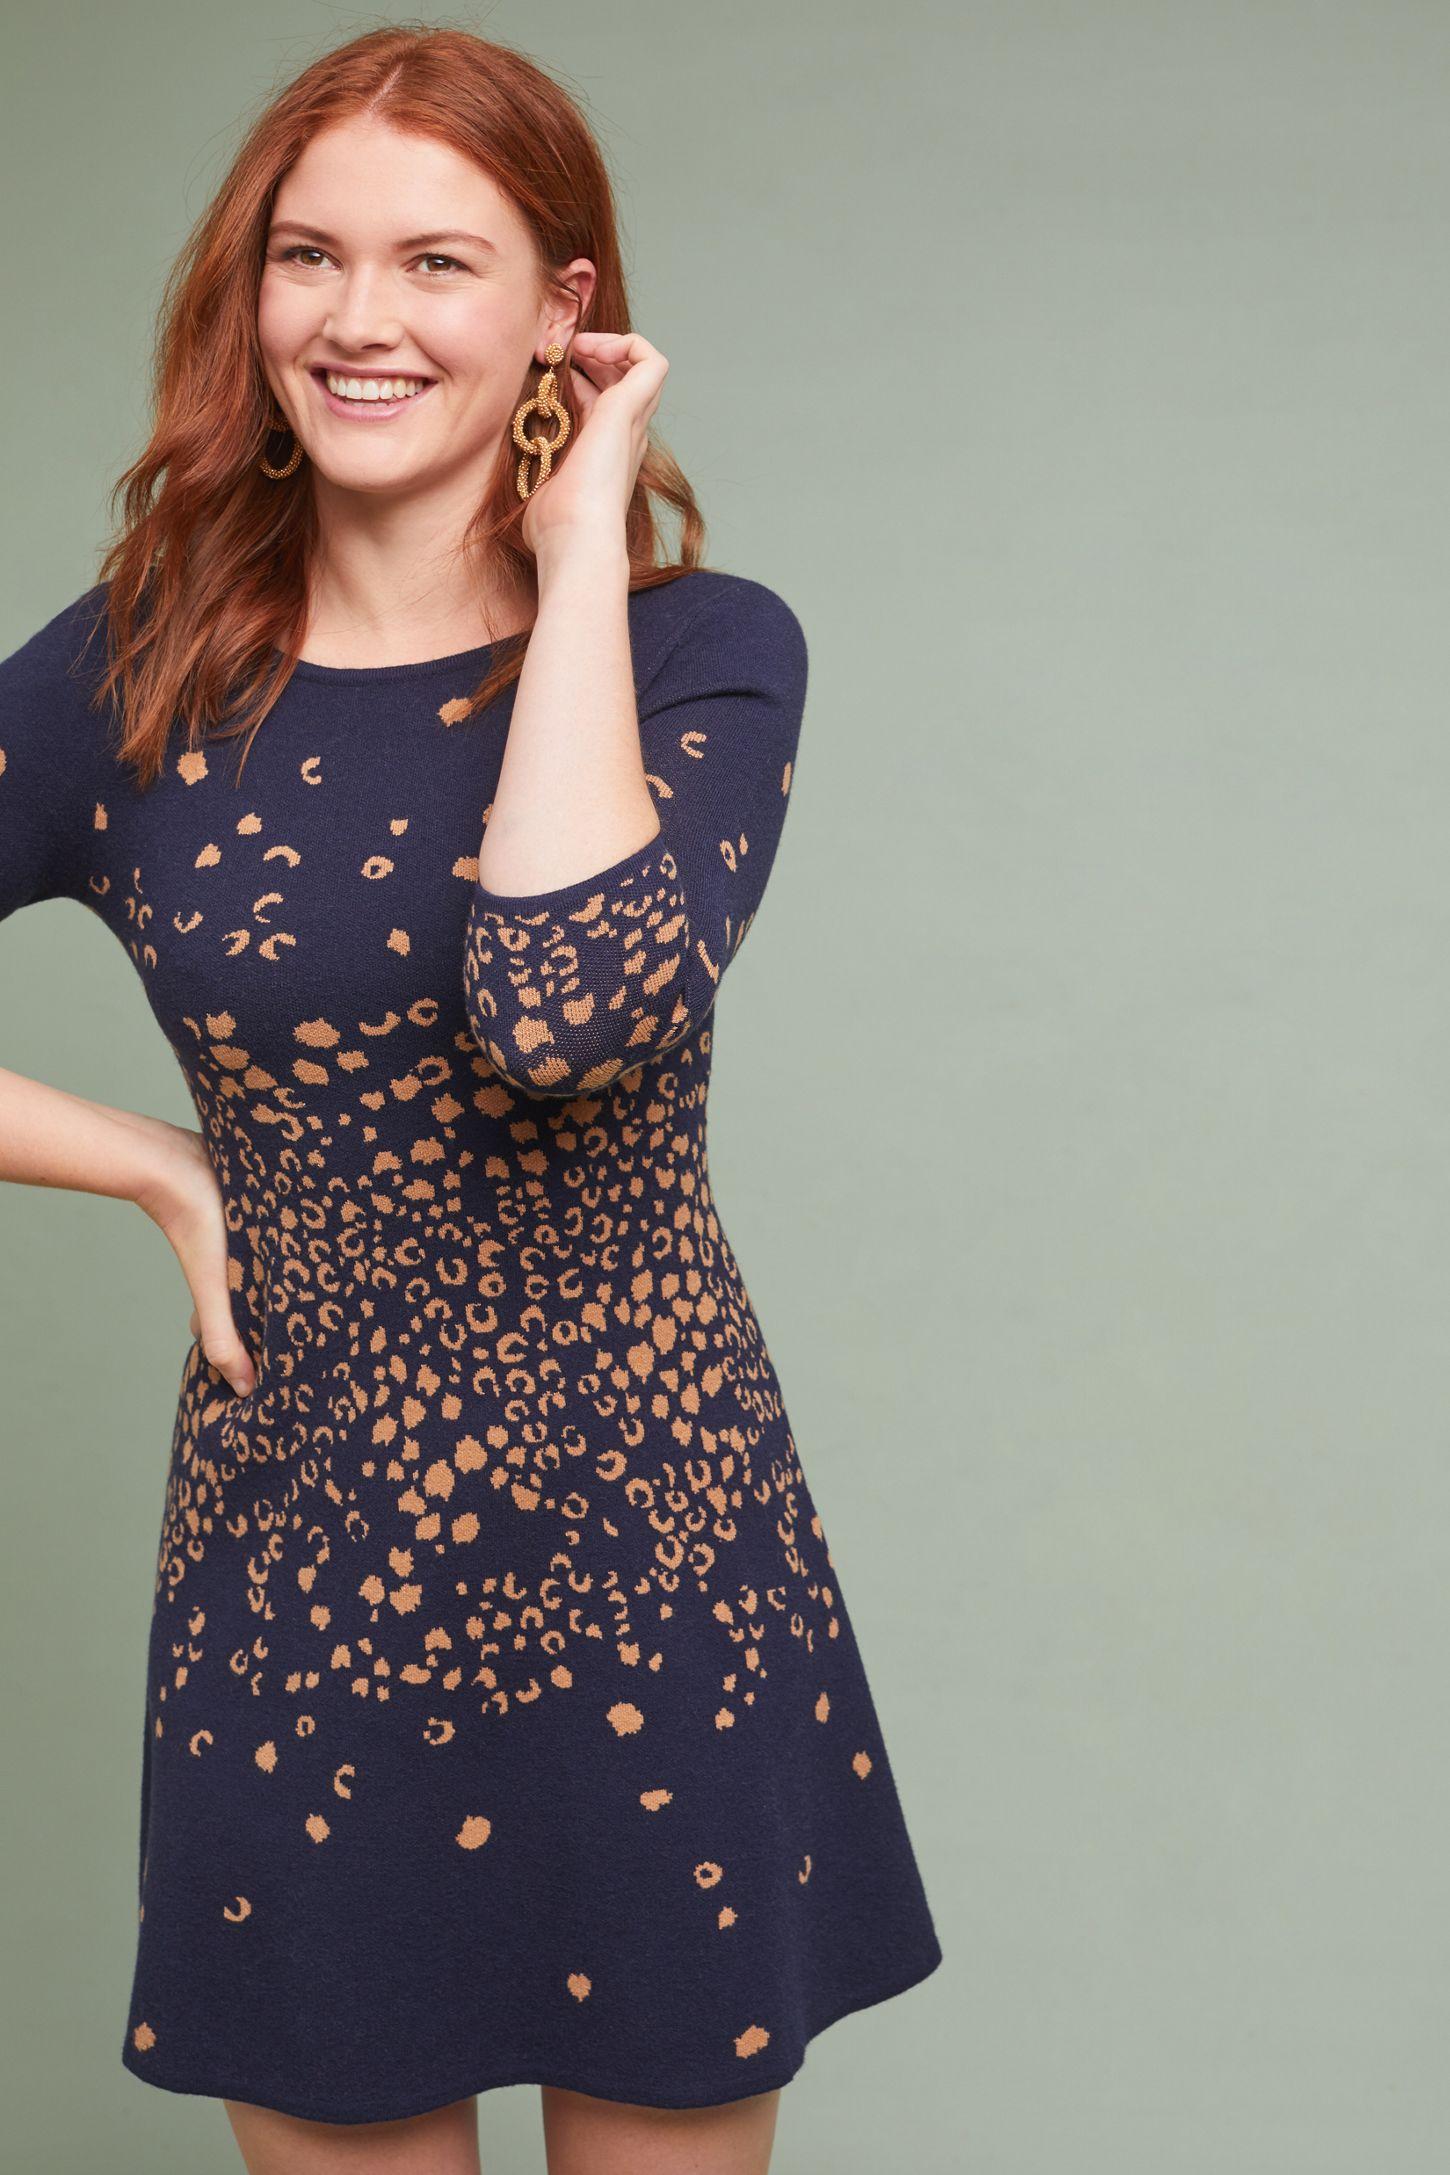 ec4a6686443 Leopard Sweater Dress